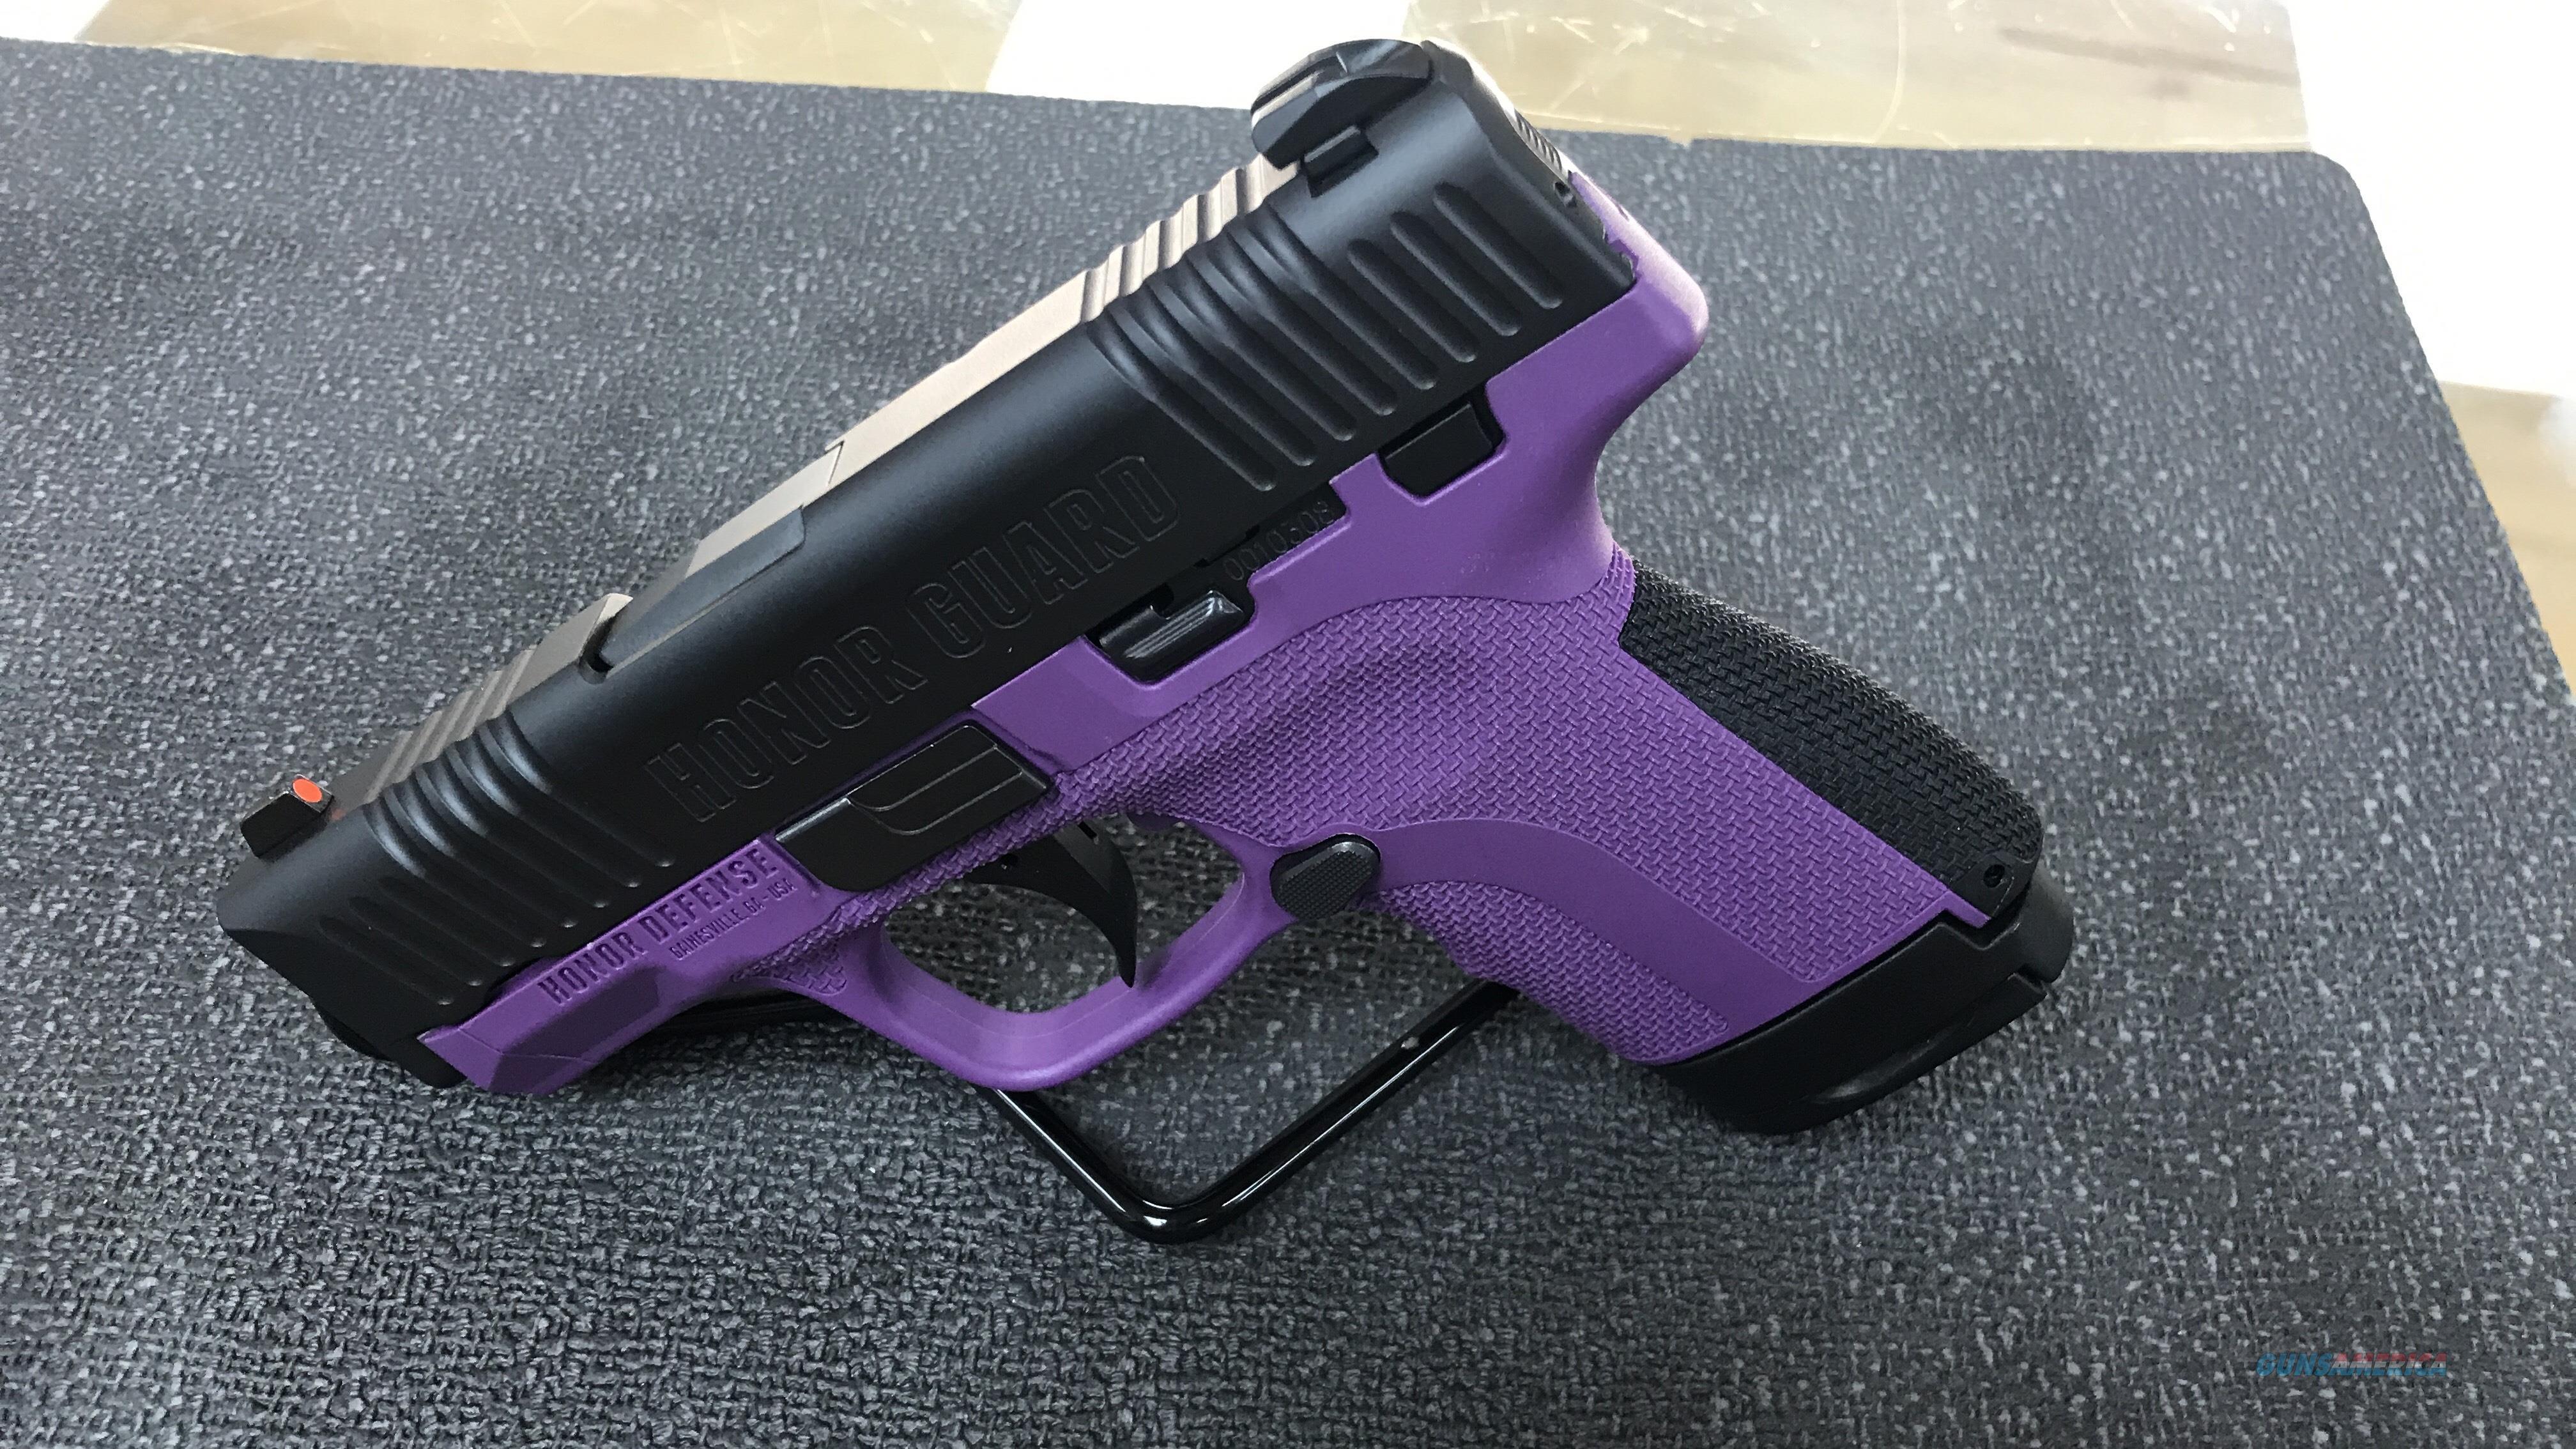 HONOR GUARD (PURPLE) 9MM    FREE SHIPPING  Guns > Pistols > Honor Defense Pistols